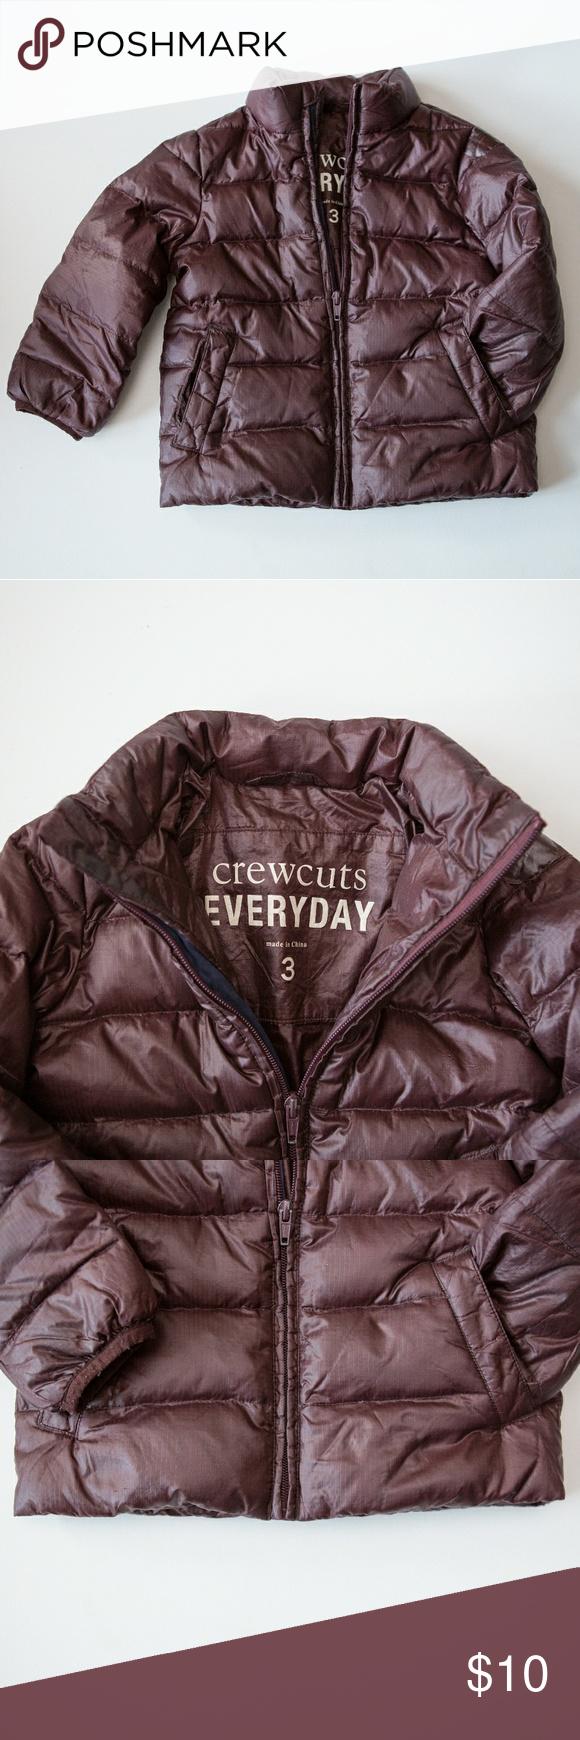 Crewcuts J Crew Kids Puffer Jacket 3t Toddler Puffer Jackets Jackets Jcrew Kids [ 1740 x 580 Pixel ]